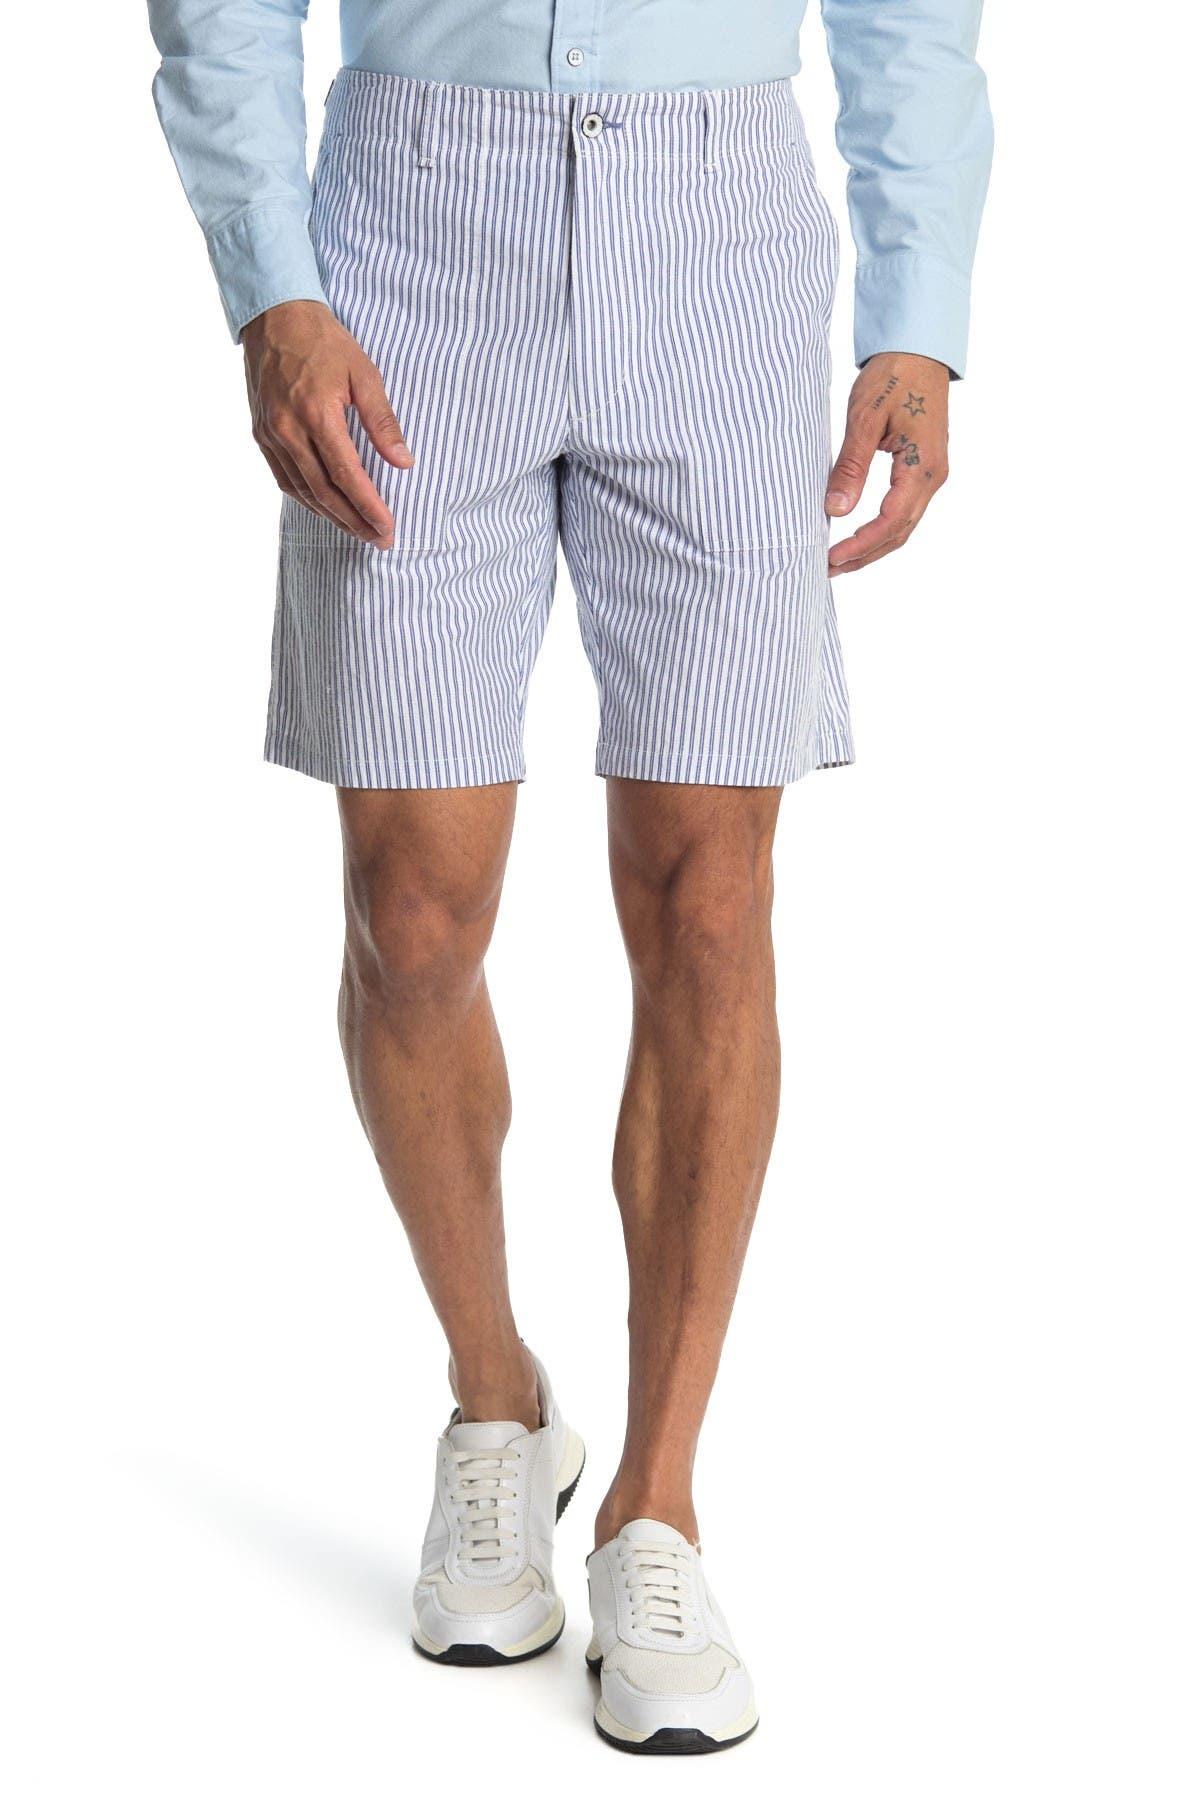 Image of Rag & Bone Franklin Railroad Stripe Shorts